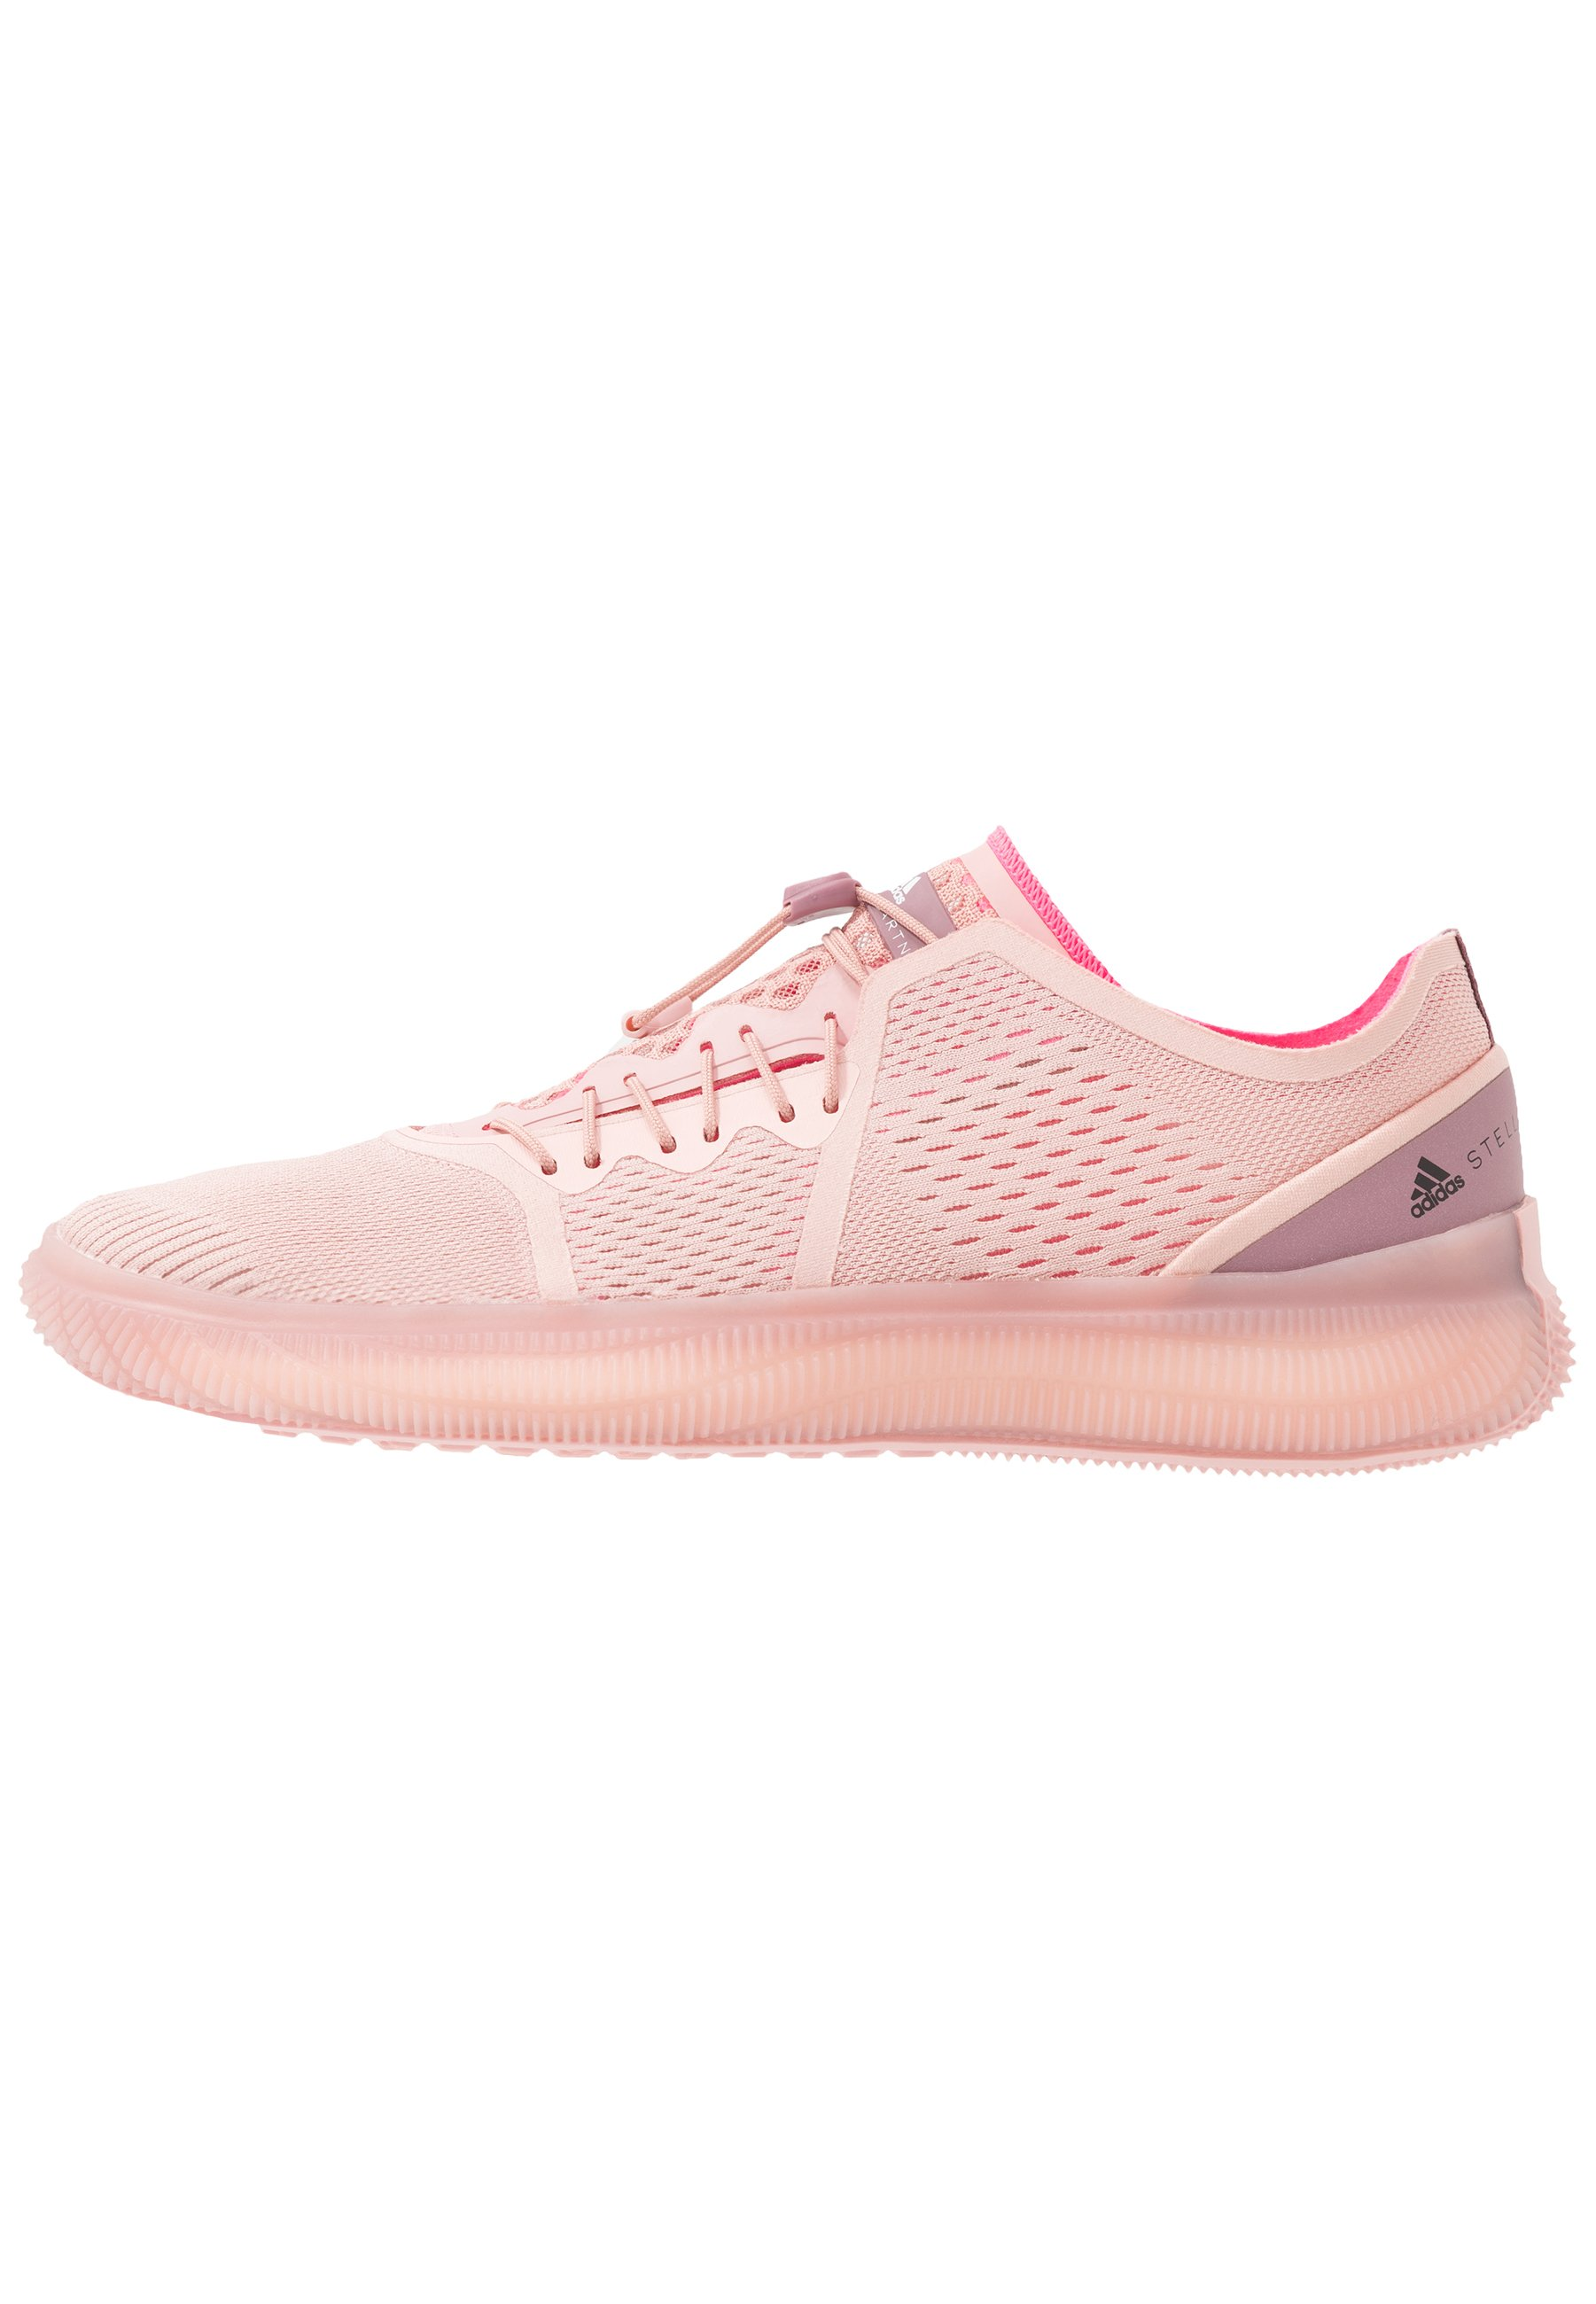 Adidas By Stella Mccartney Pureboost Trainer S. - Kuntoilukengät Pink Spice/ultra Pop/footwear White